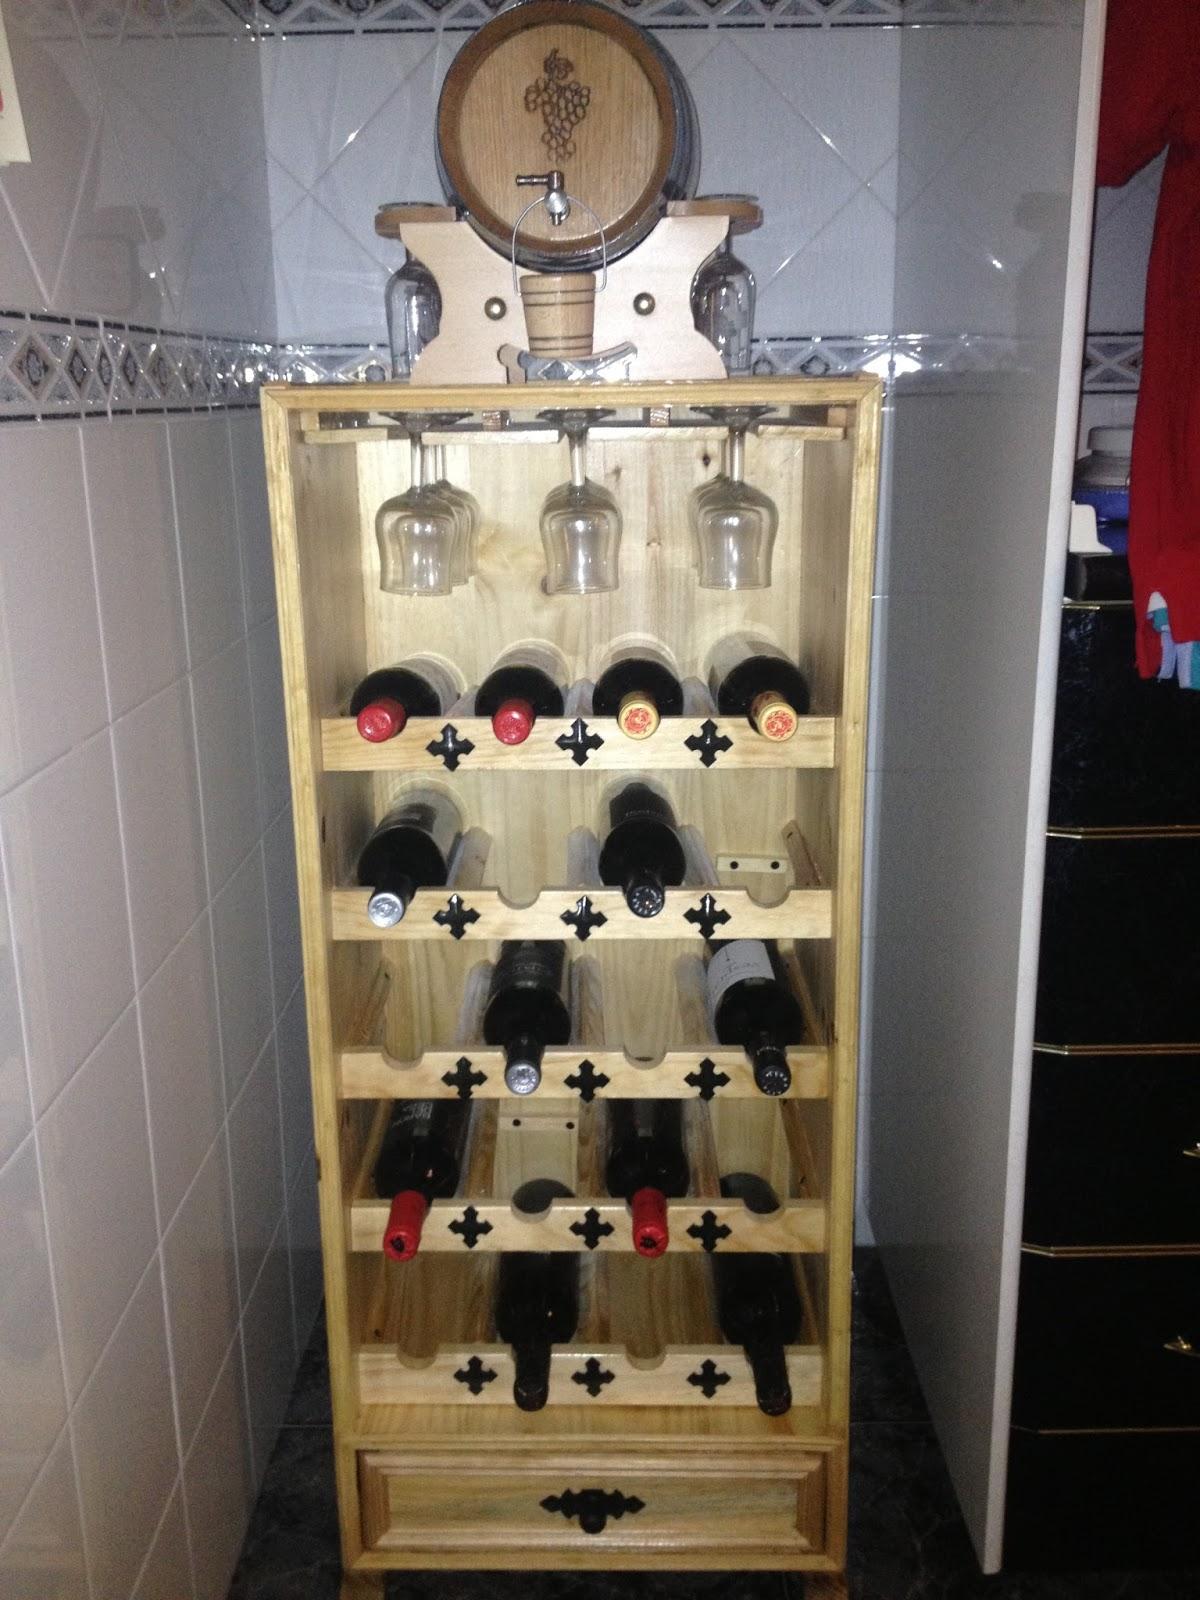 Vinoteca jos m vinoteca de madera con soporte para copas - Vinotecas de madera ...